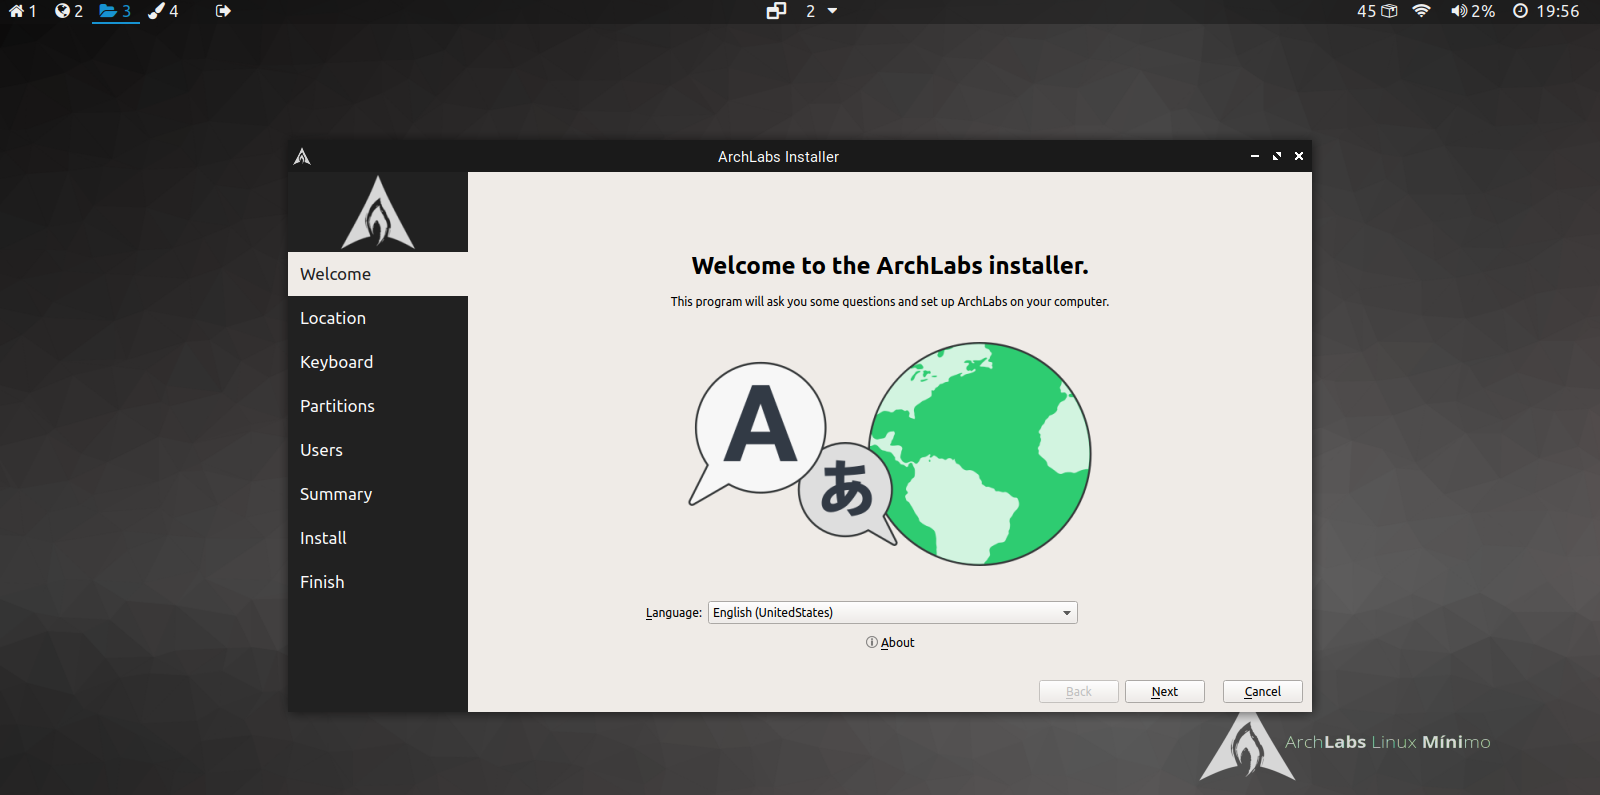 archlabs minimo installation